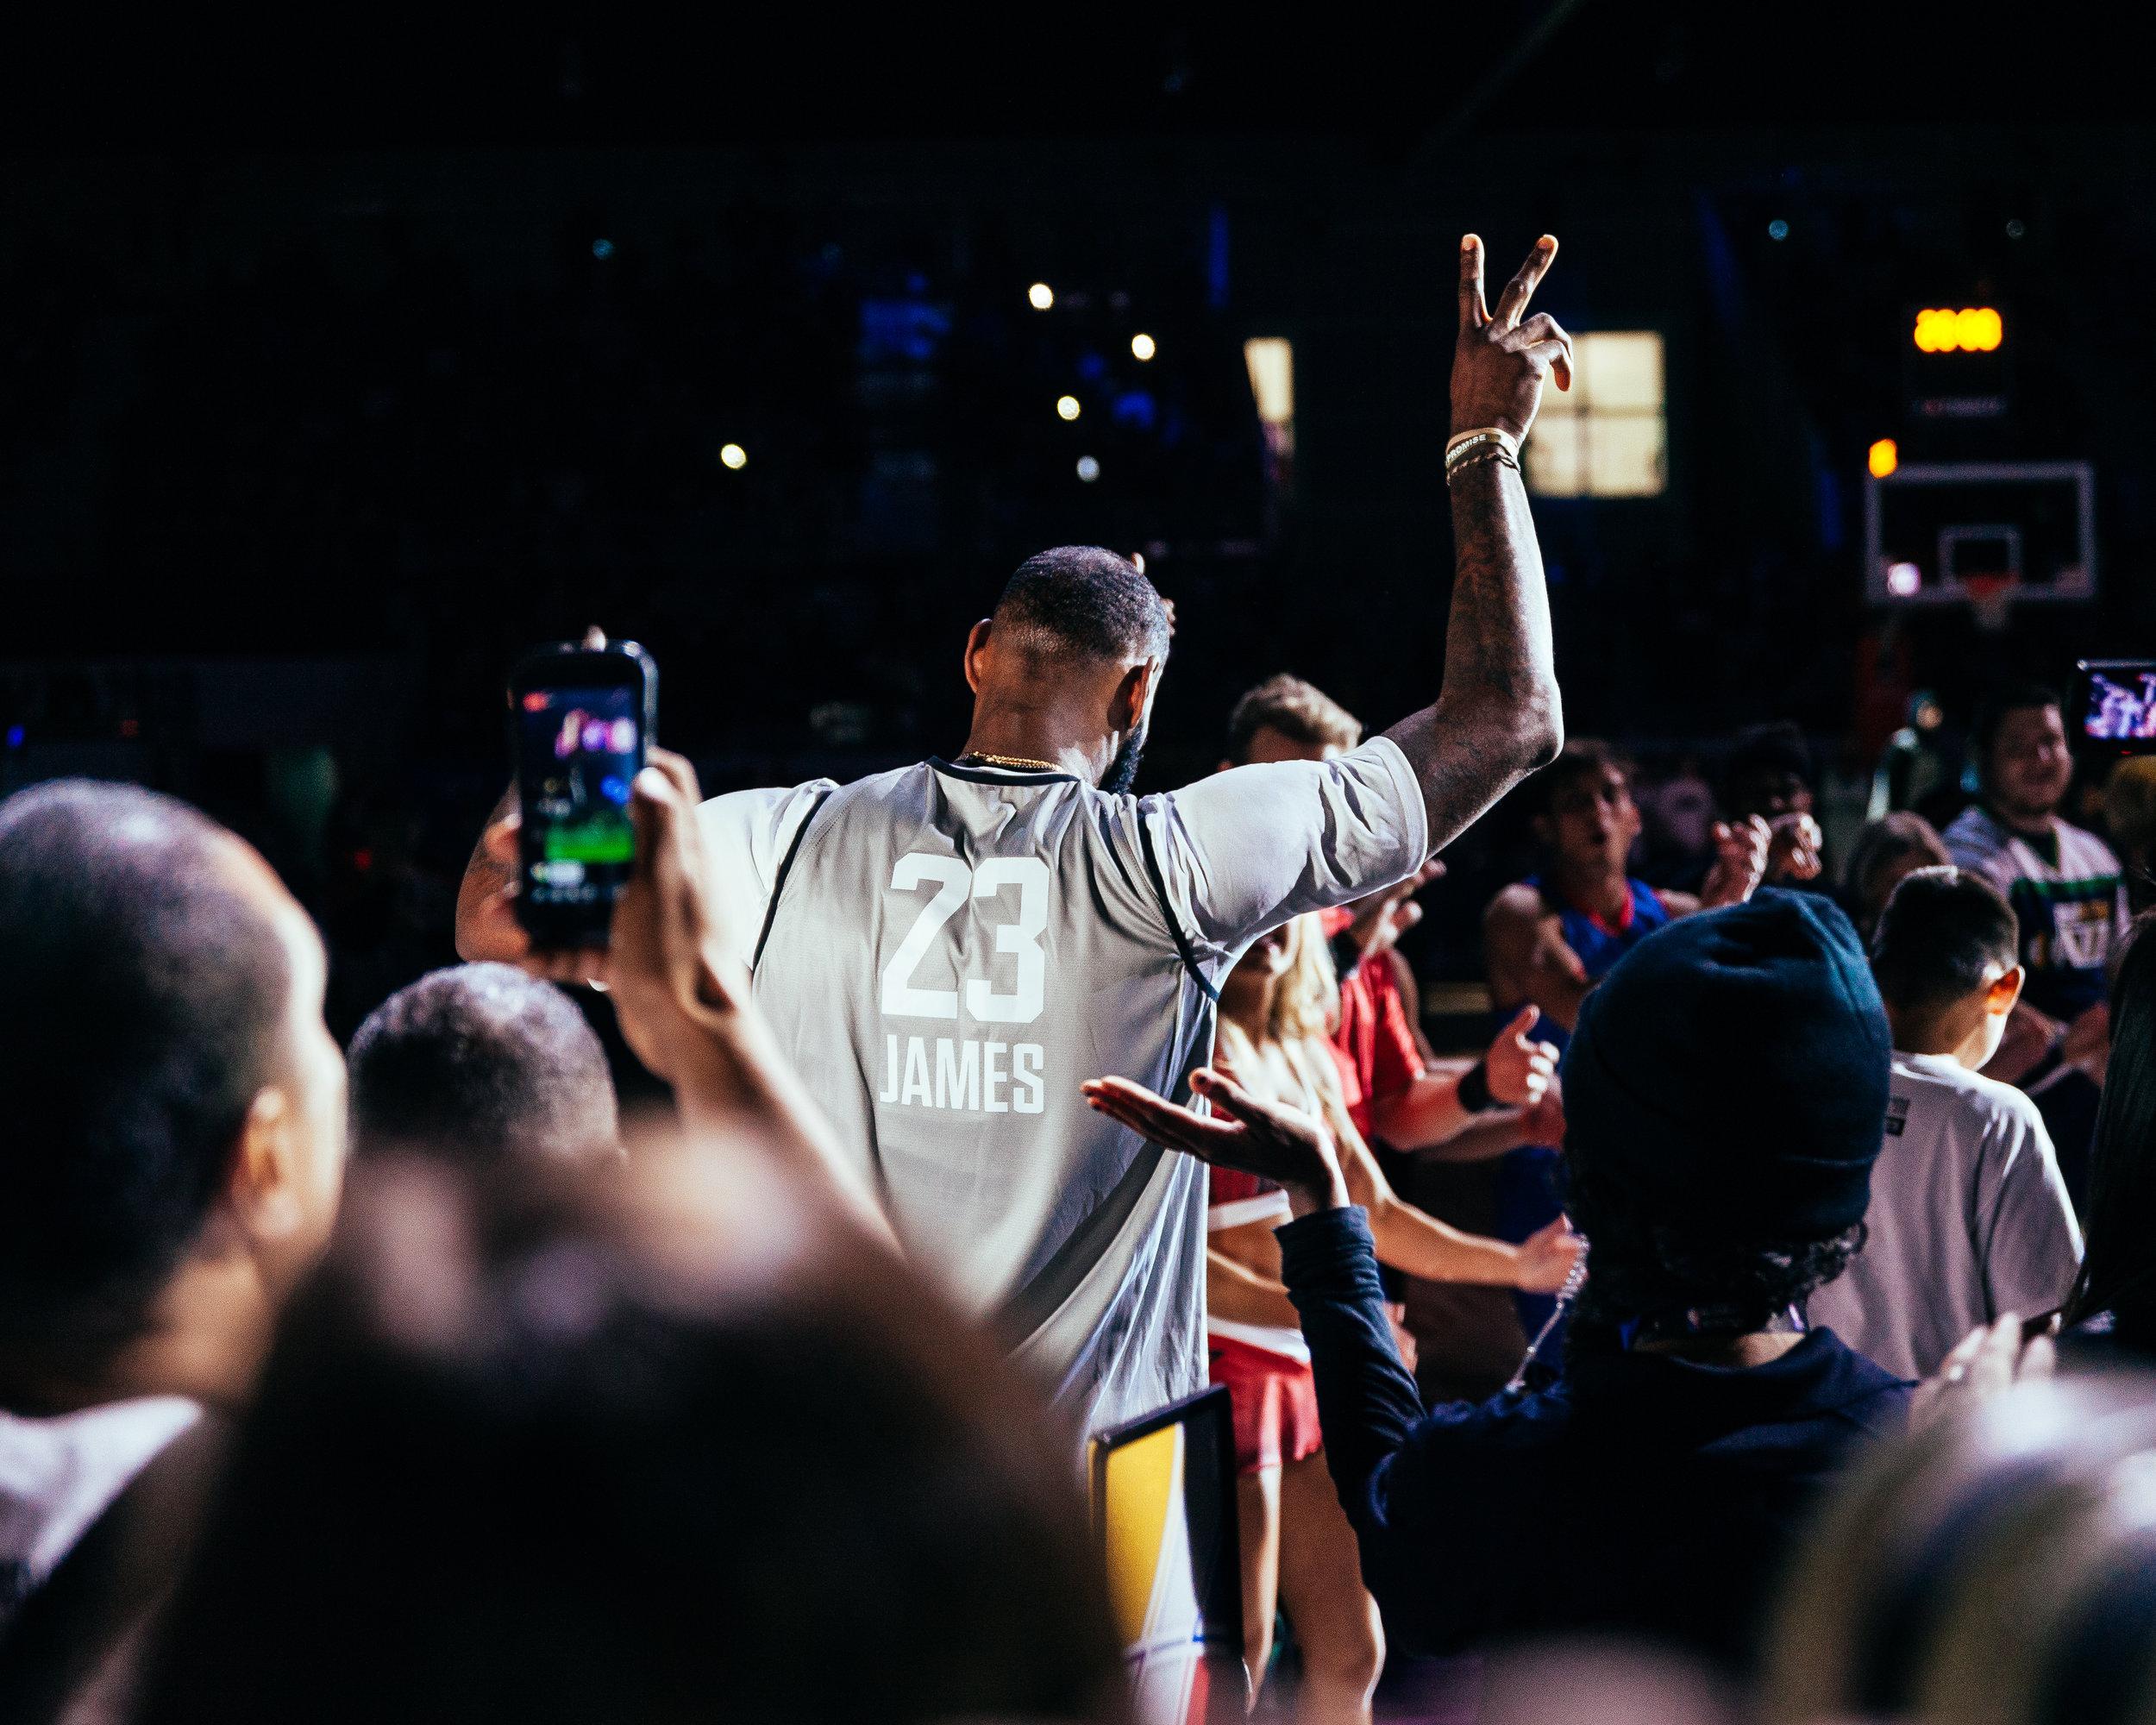 02172018_LEBRON_JAMES_NBA_ALLSTAR_WEEKEND_KENNETH_STGEORGE_PHOTOGRAPHY-2.jpg